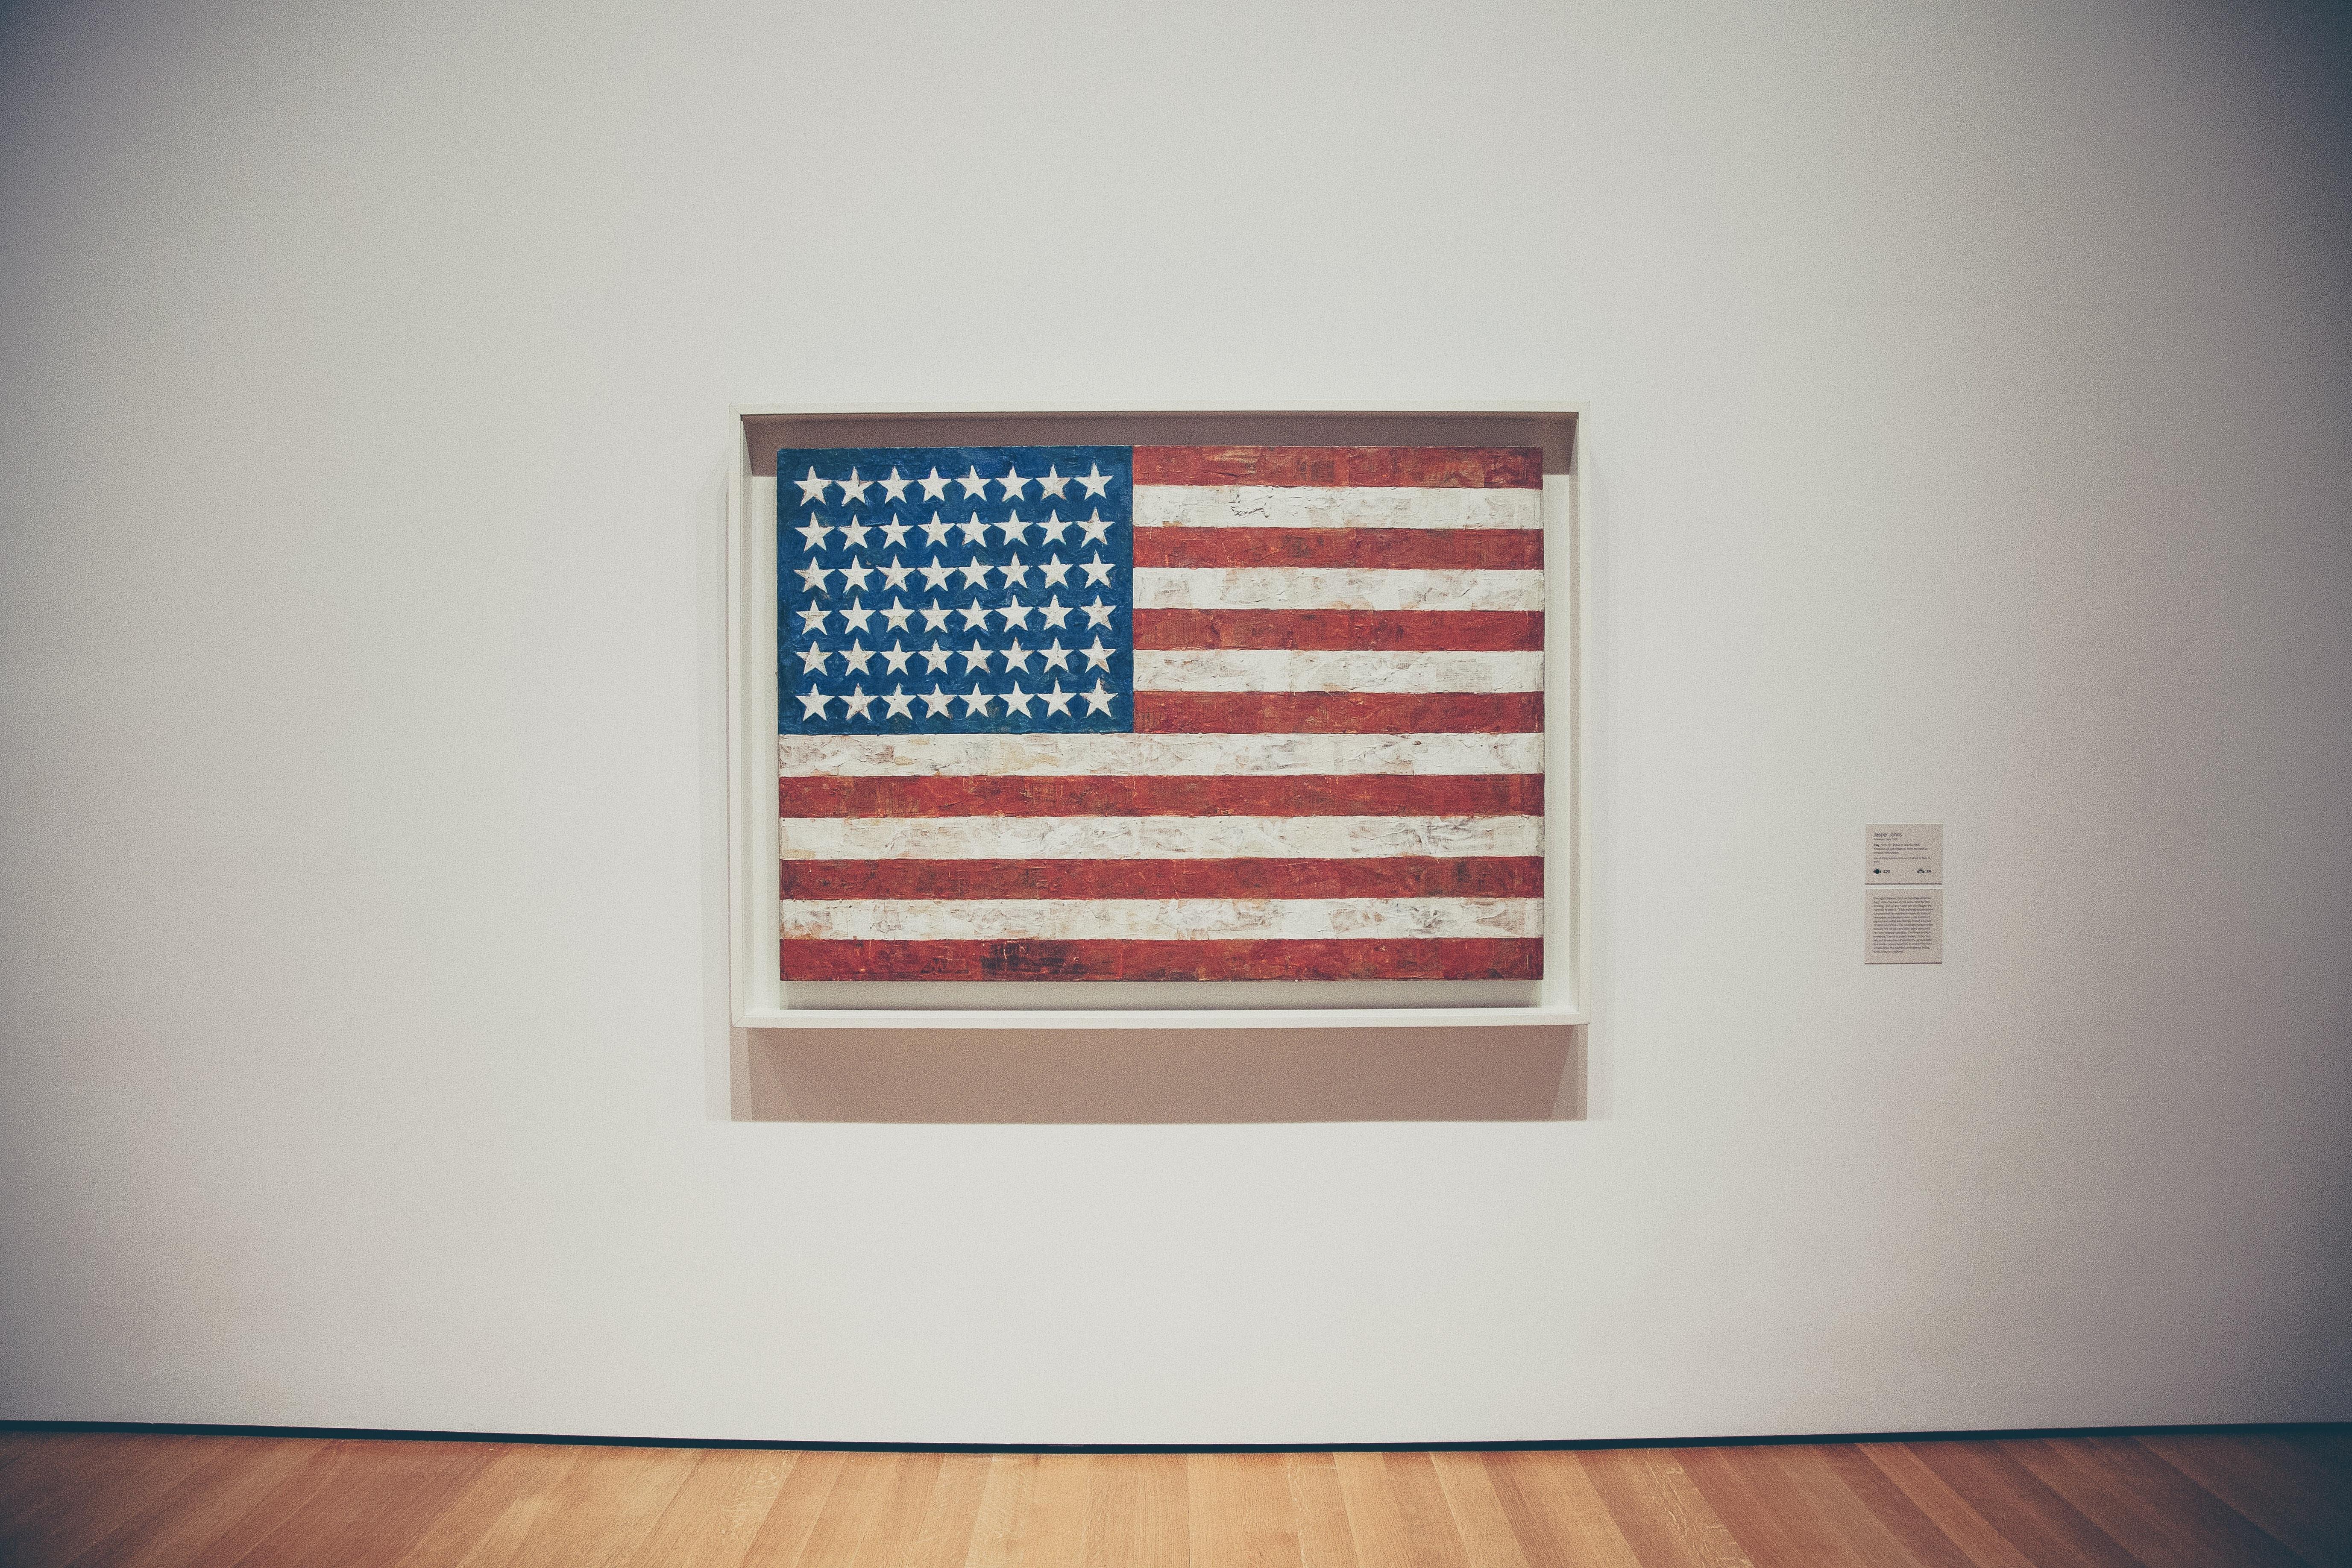 U.S.A. flag on wall with frame